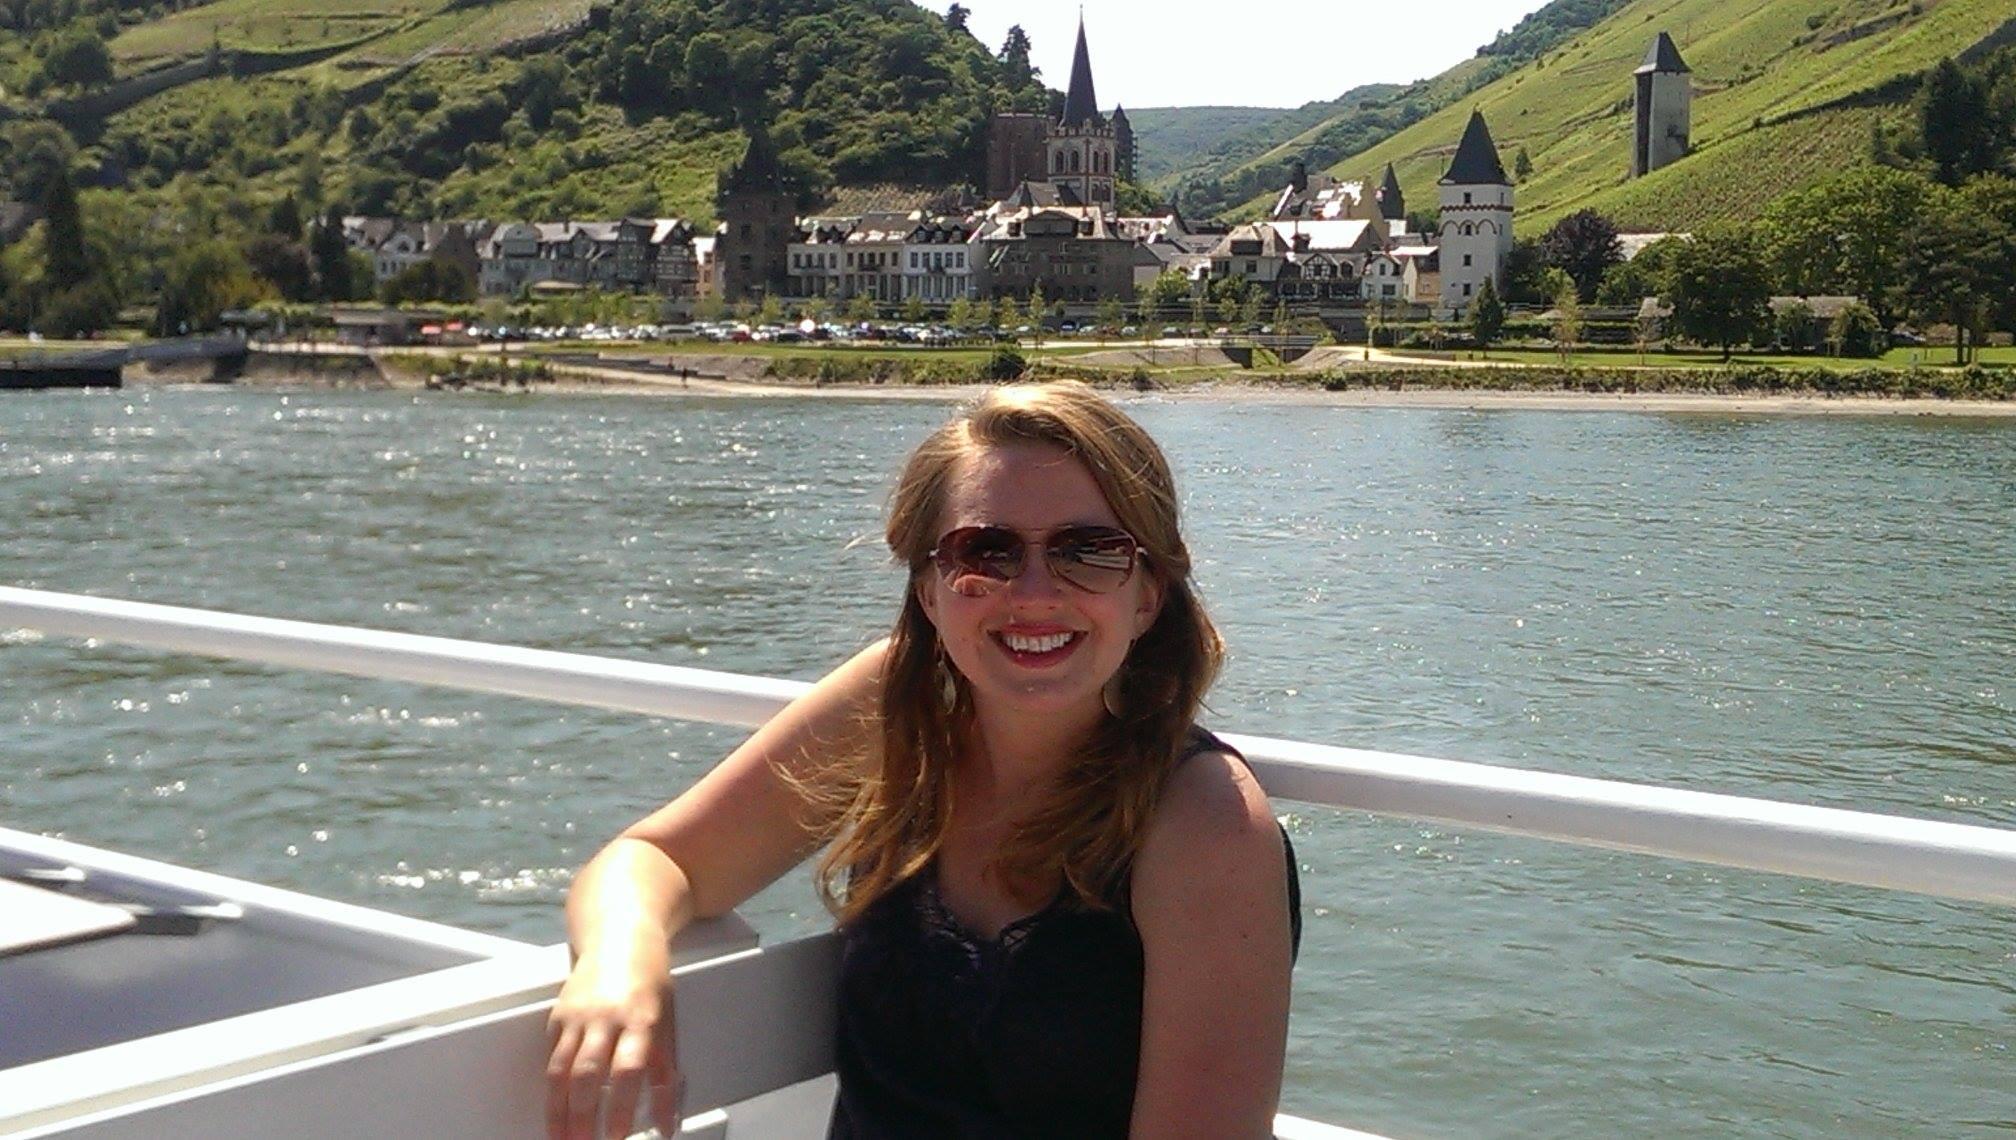 Ericka enjoying a cruise on the Rhine River in Germany.